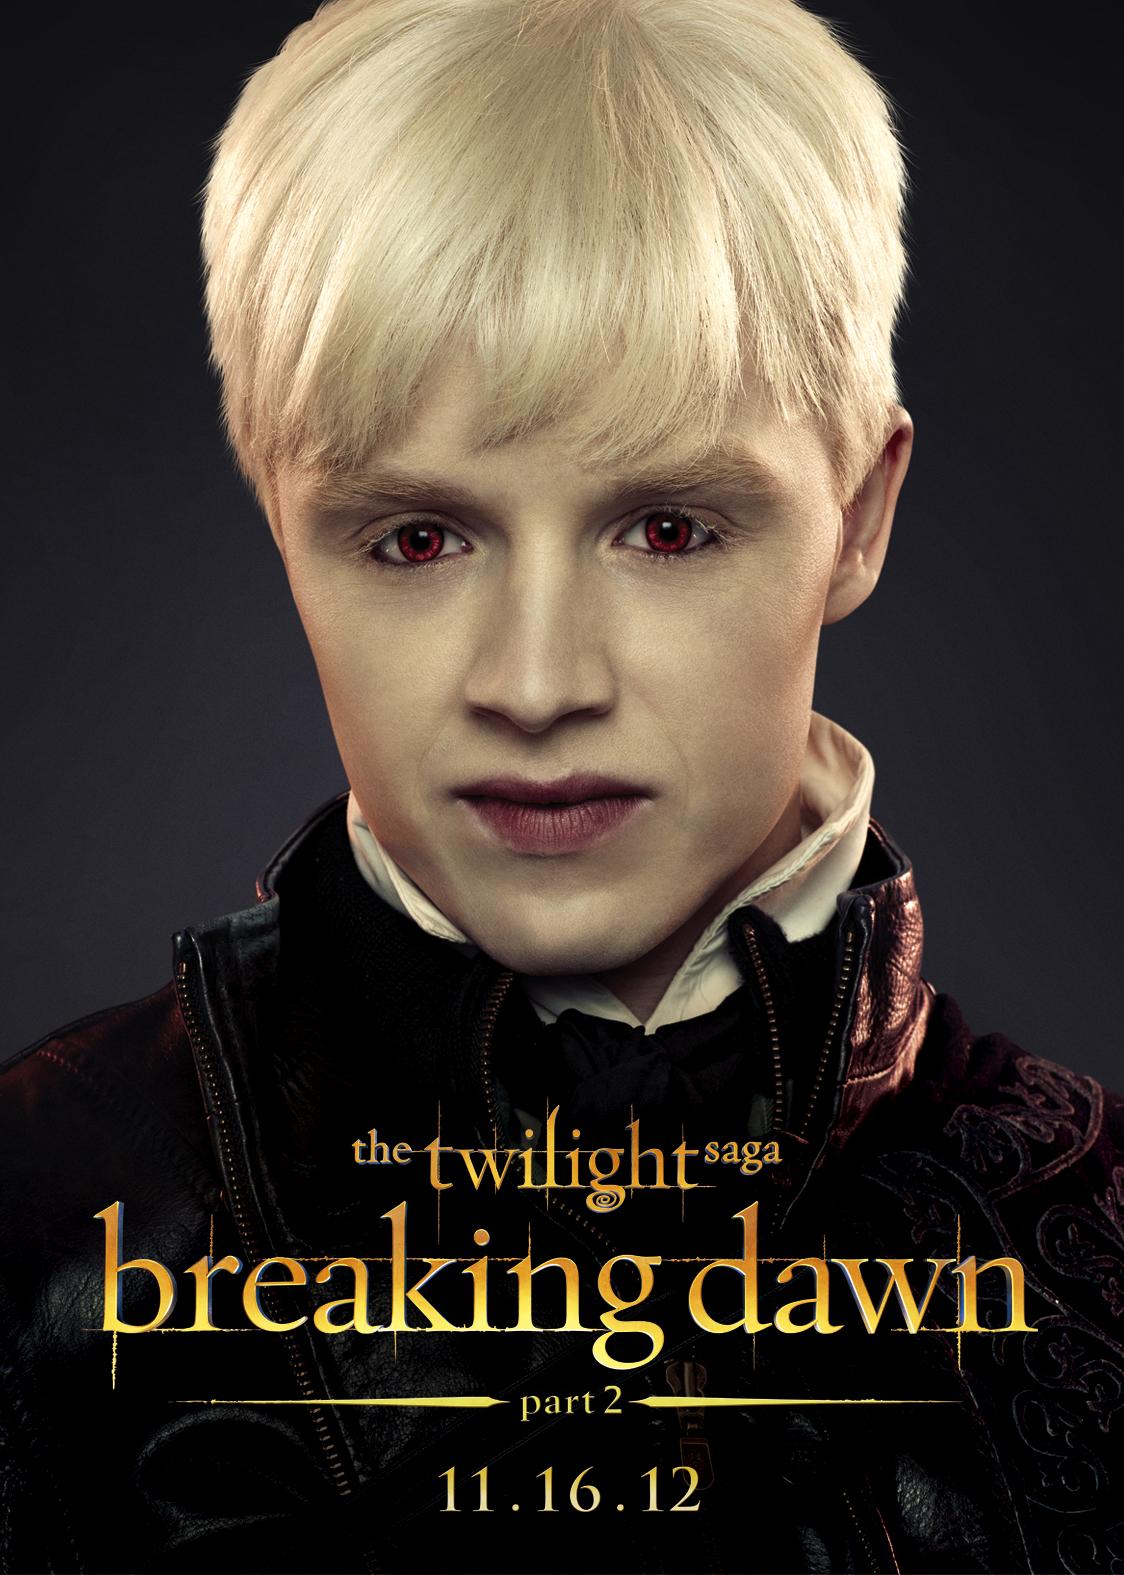 The Twilight Saga: Breaking Dawn Part 2 - Movies Maniac